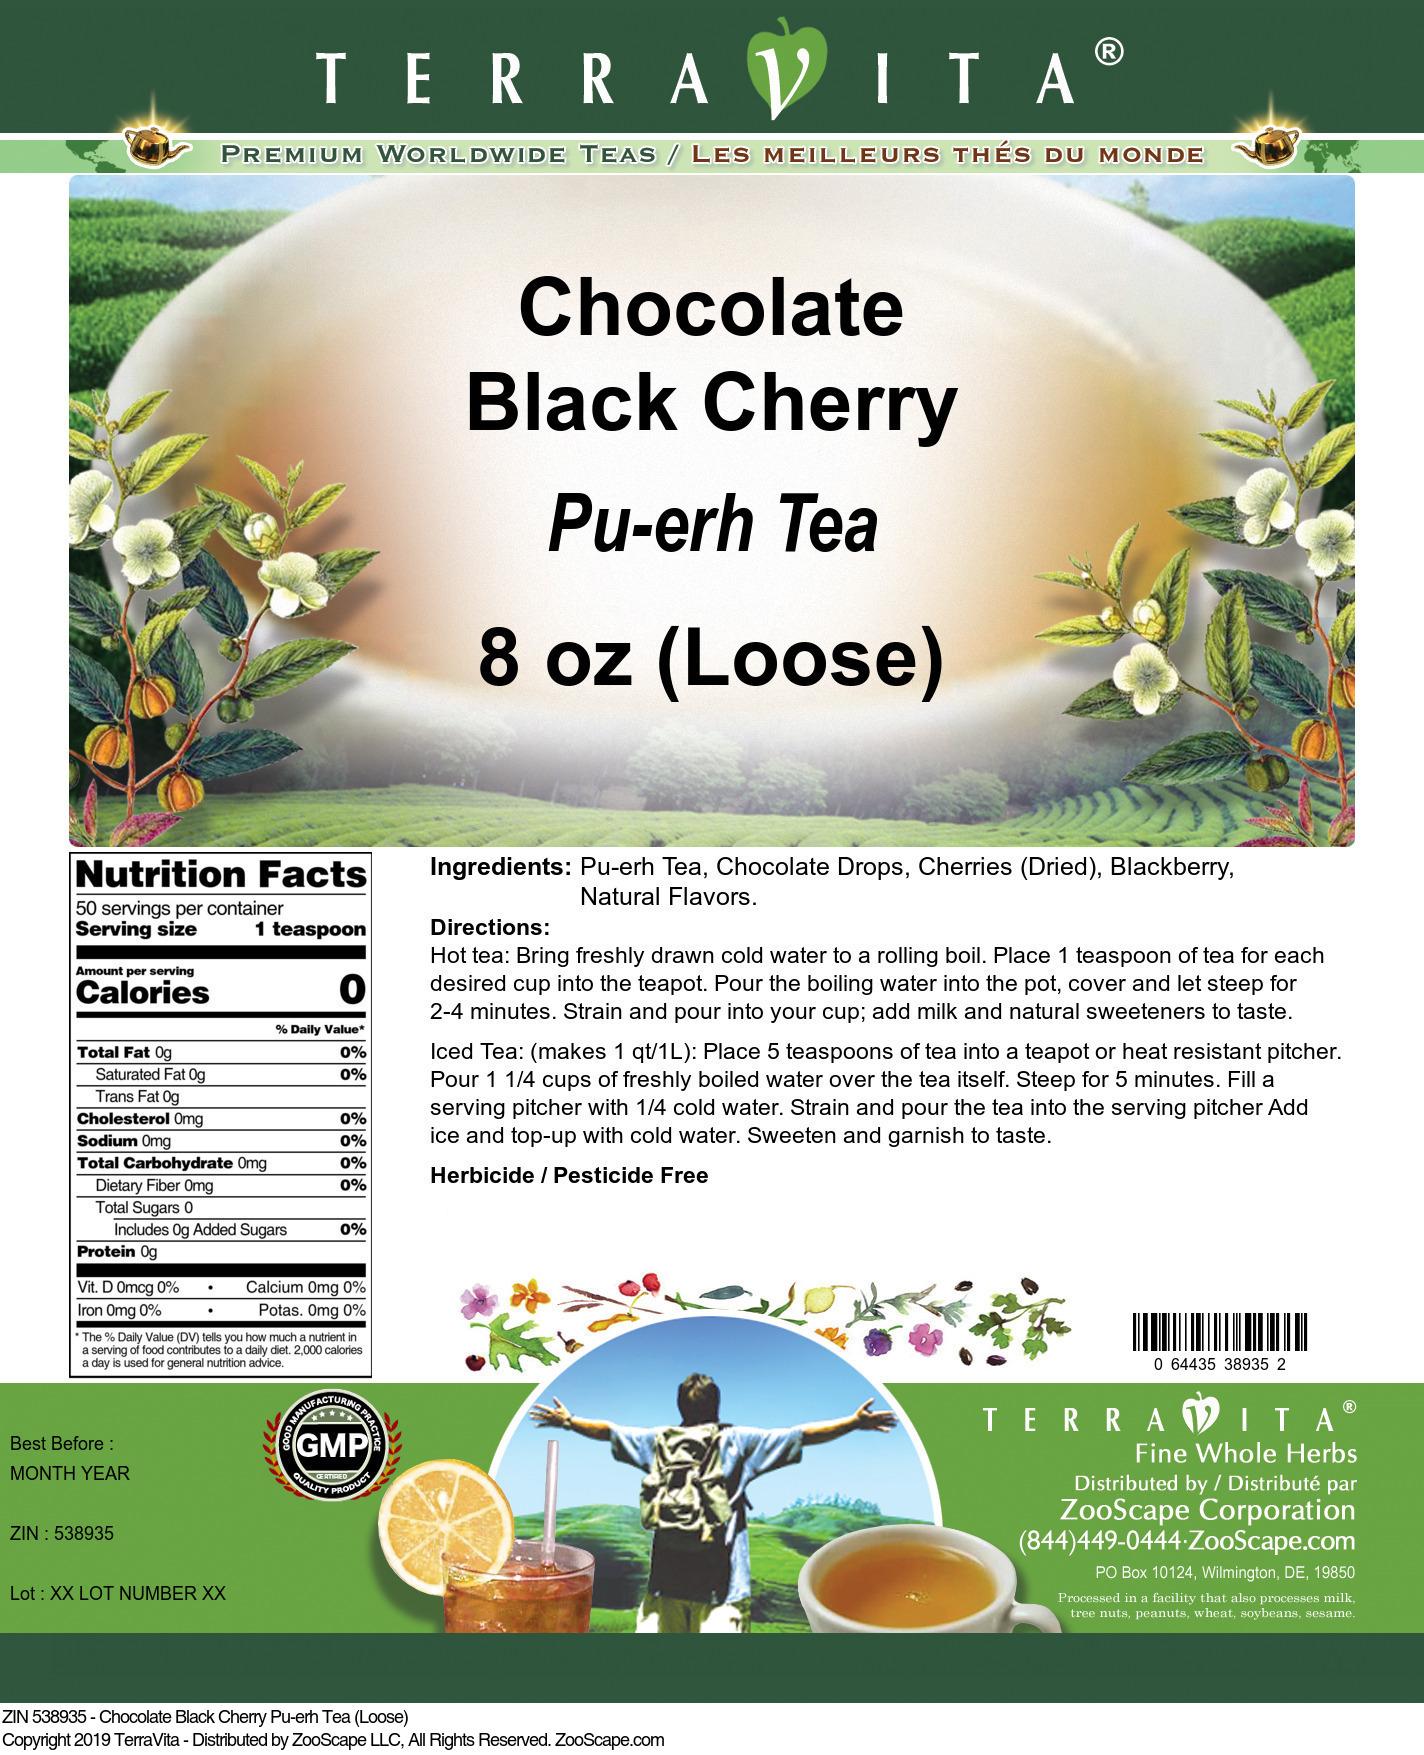 Chocolate Black Cherry Pu-erh Tea